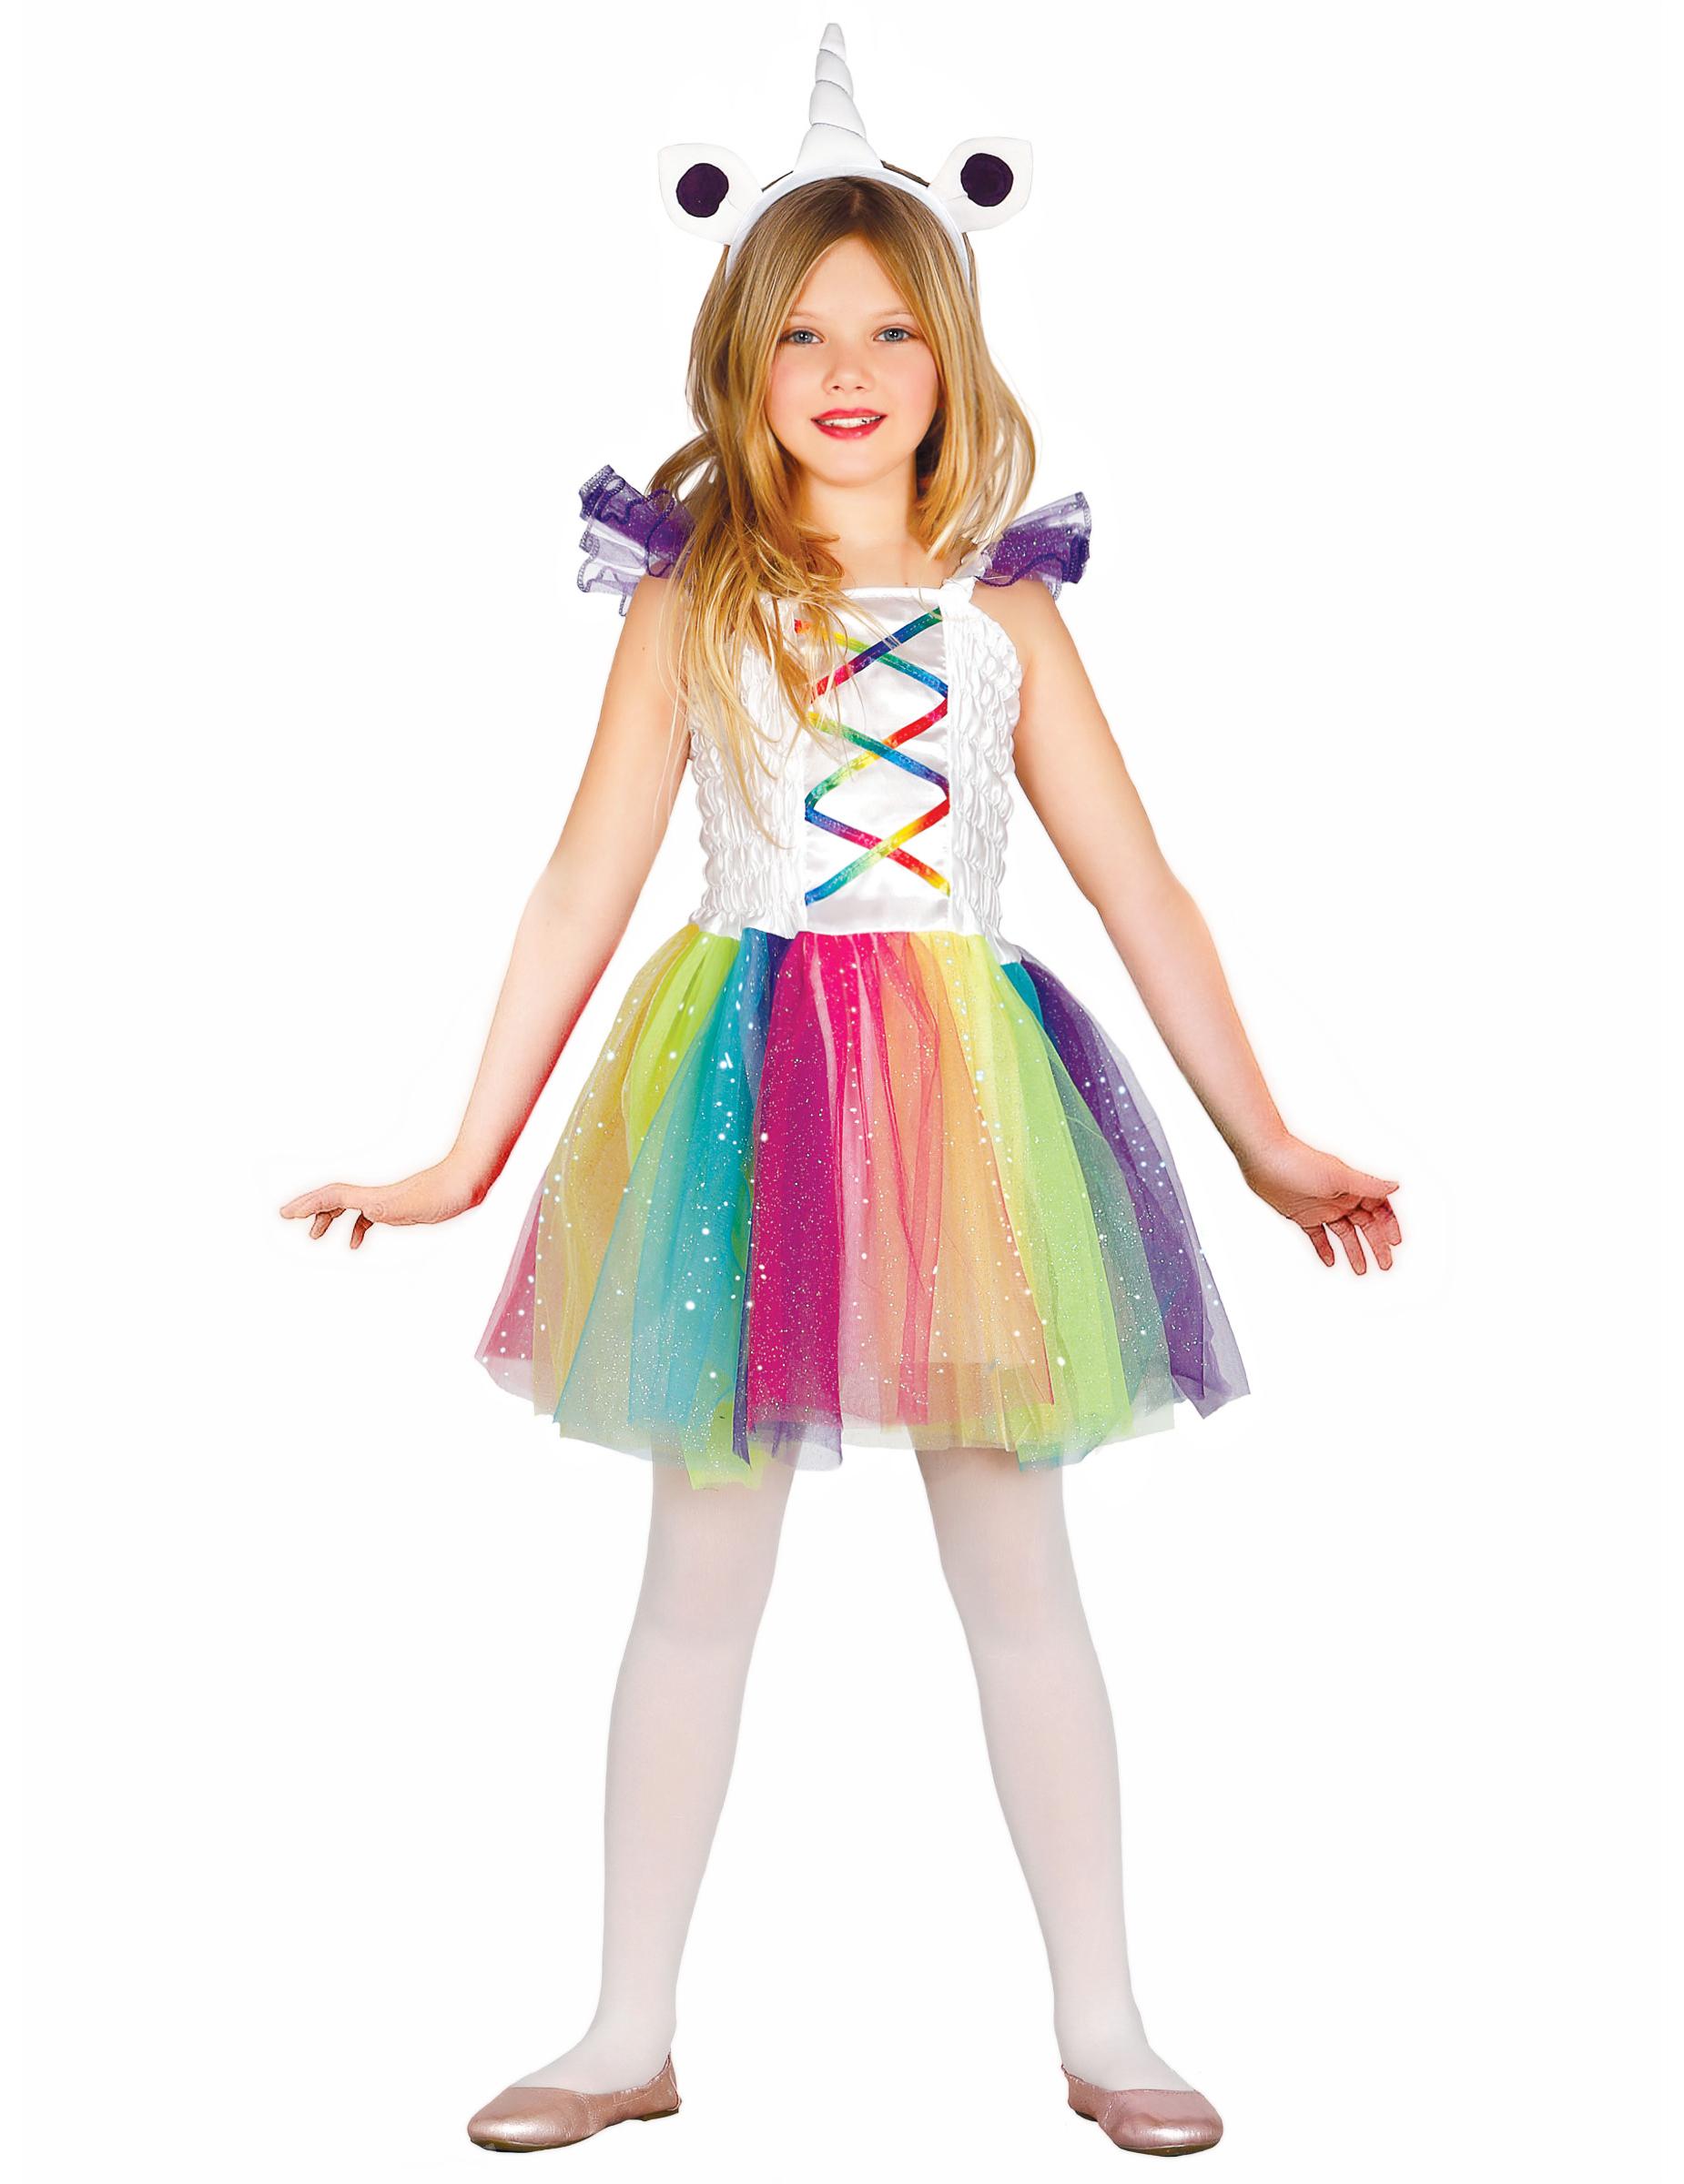 ac8c38513 Disfarce Miss unicórnio menina  Disfarces Crianças